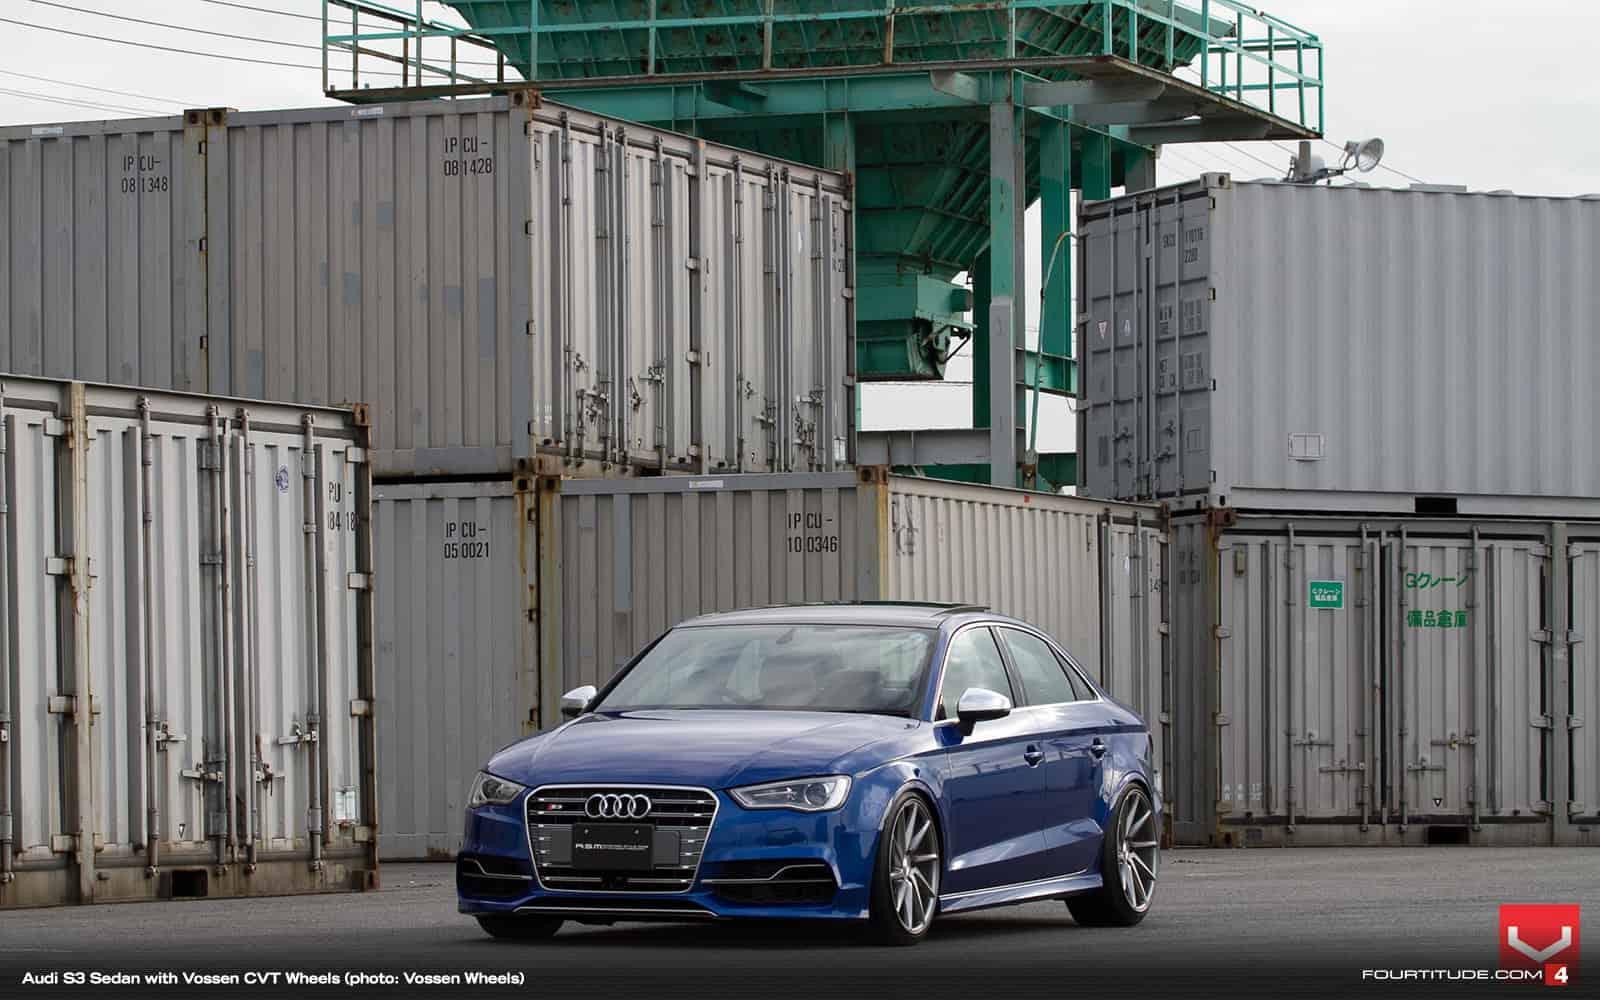 Audi-S3-sedan-Vossen-CVT-Naples-Speed-343